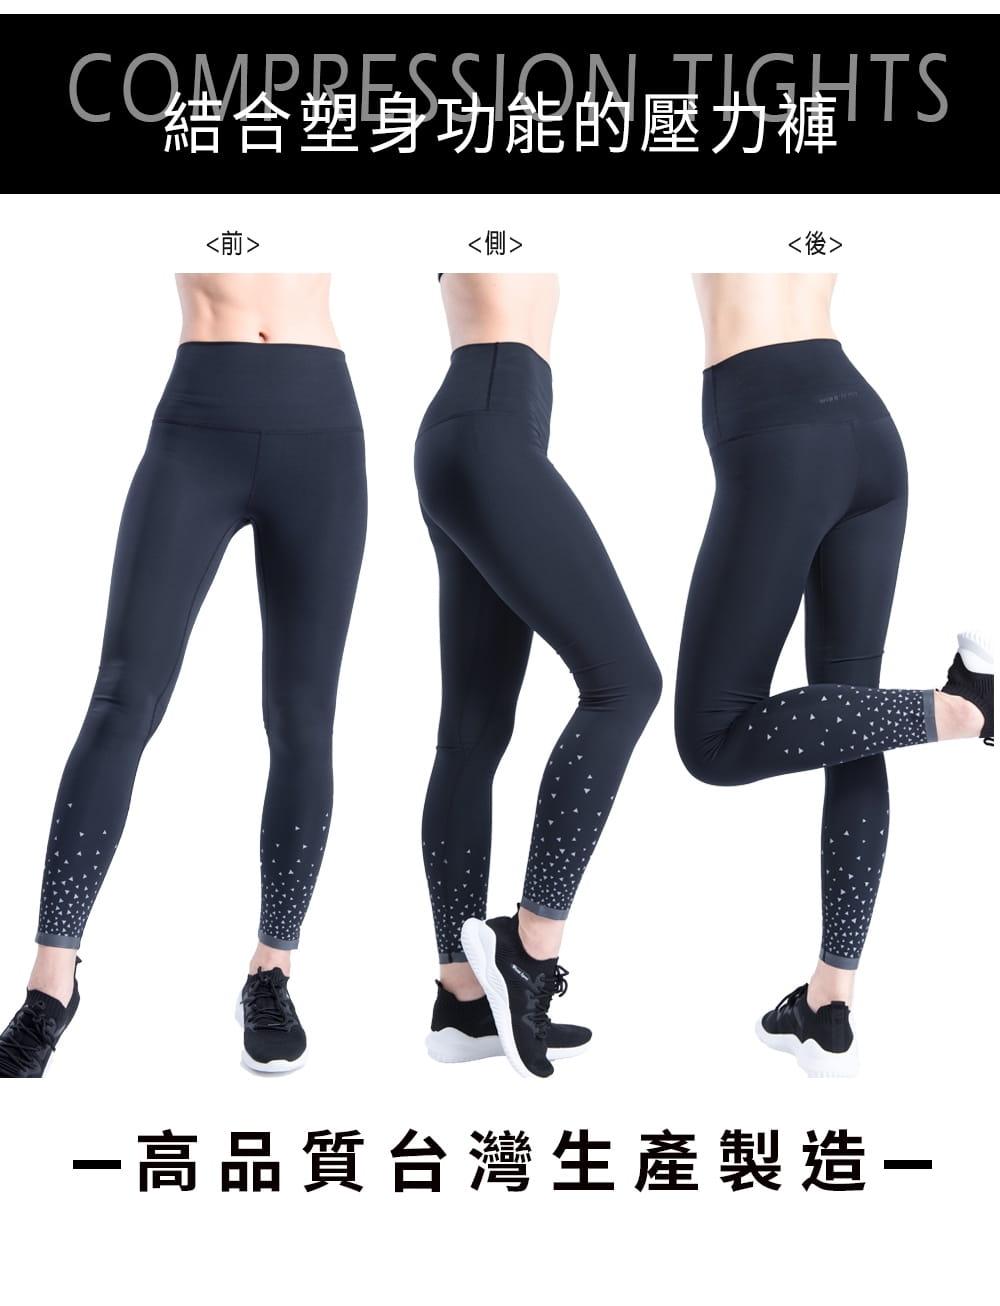 【WISENFIT】台灣製- 高腰束腹緊身褲 6